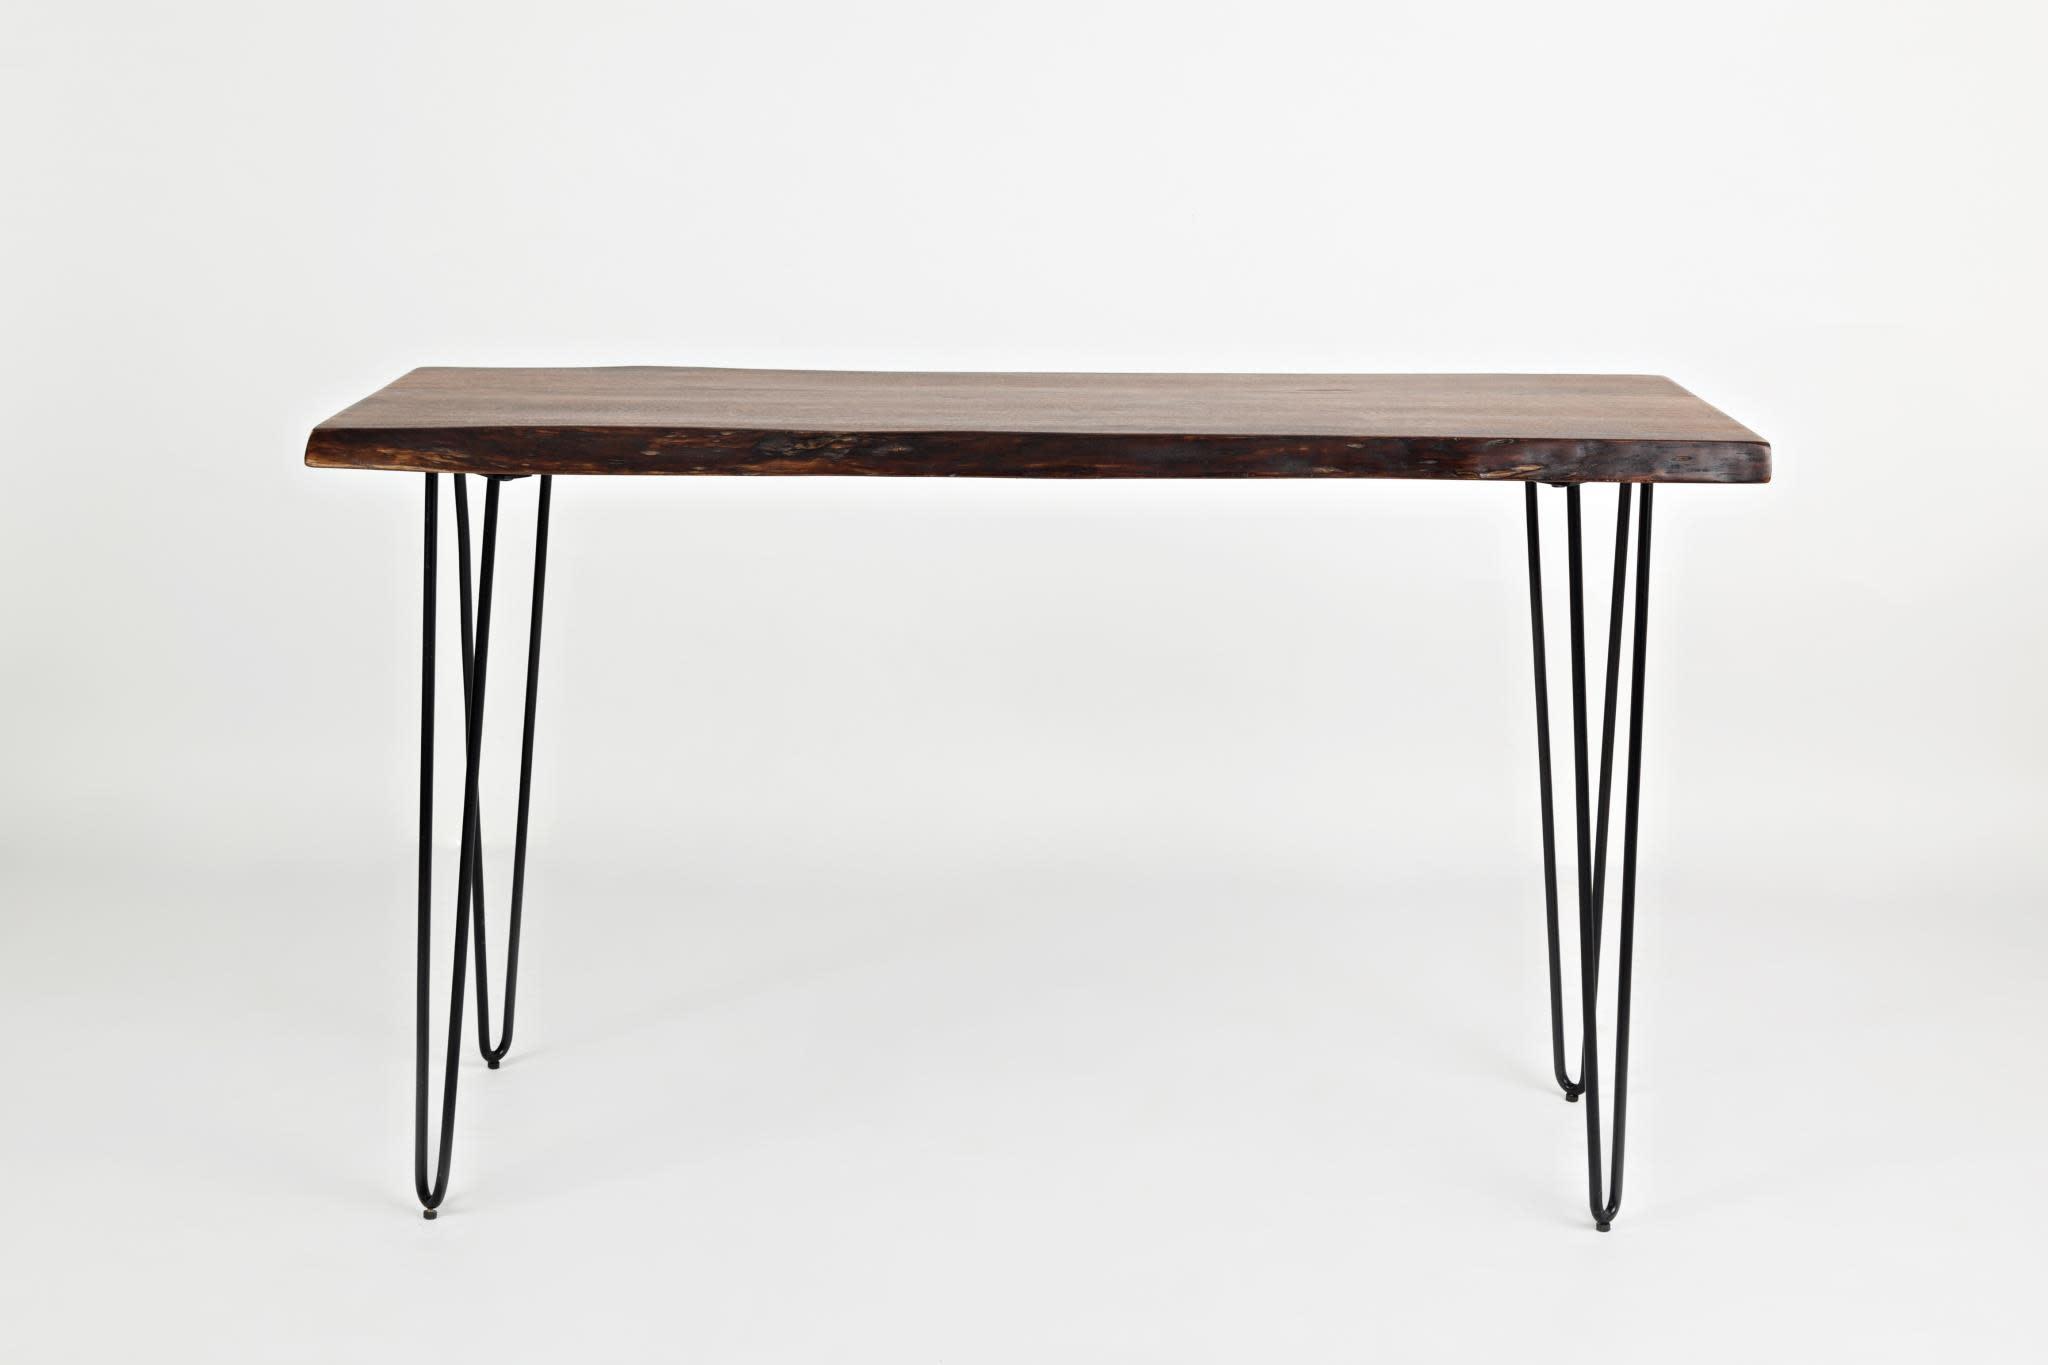 Jofran Natures Edge Light Chestnut Sofa Table